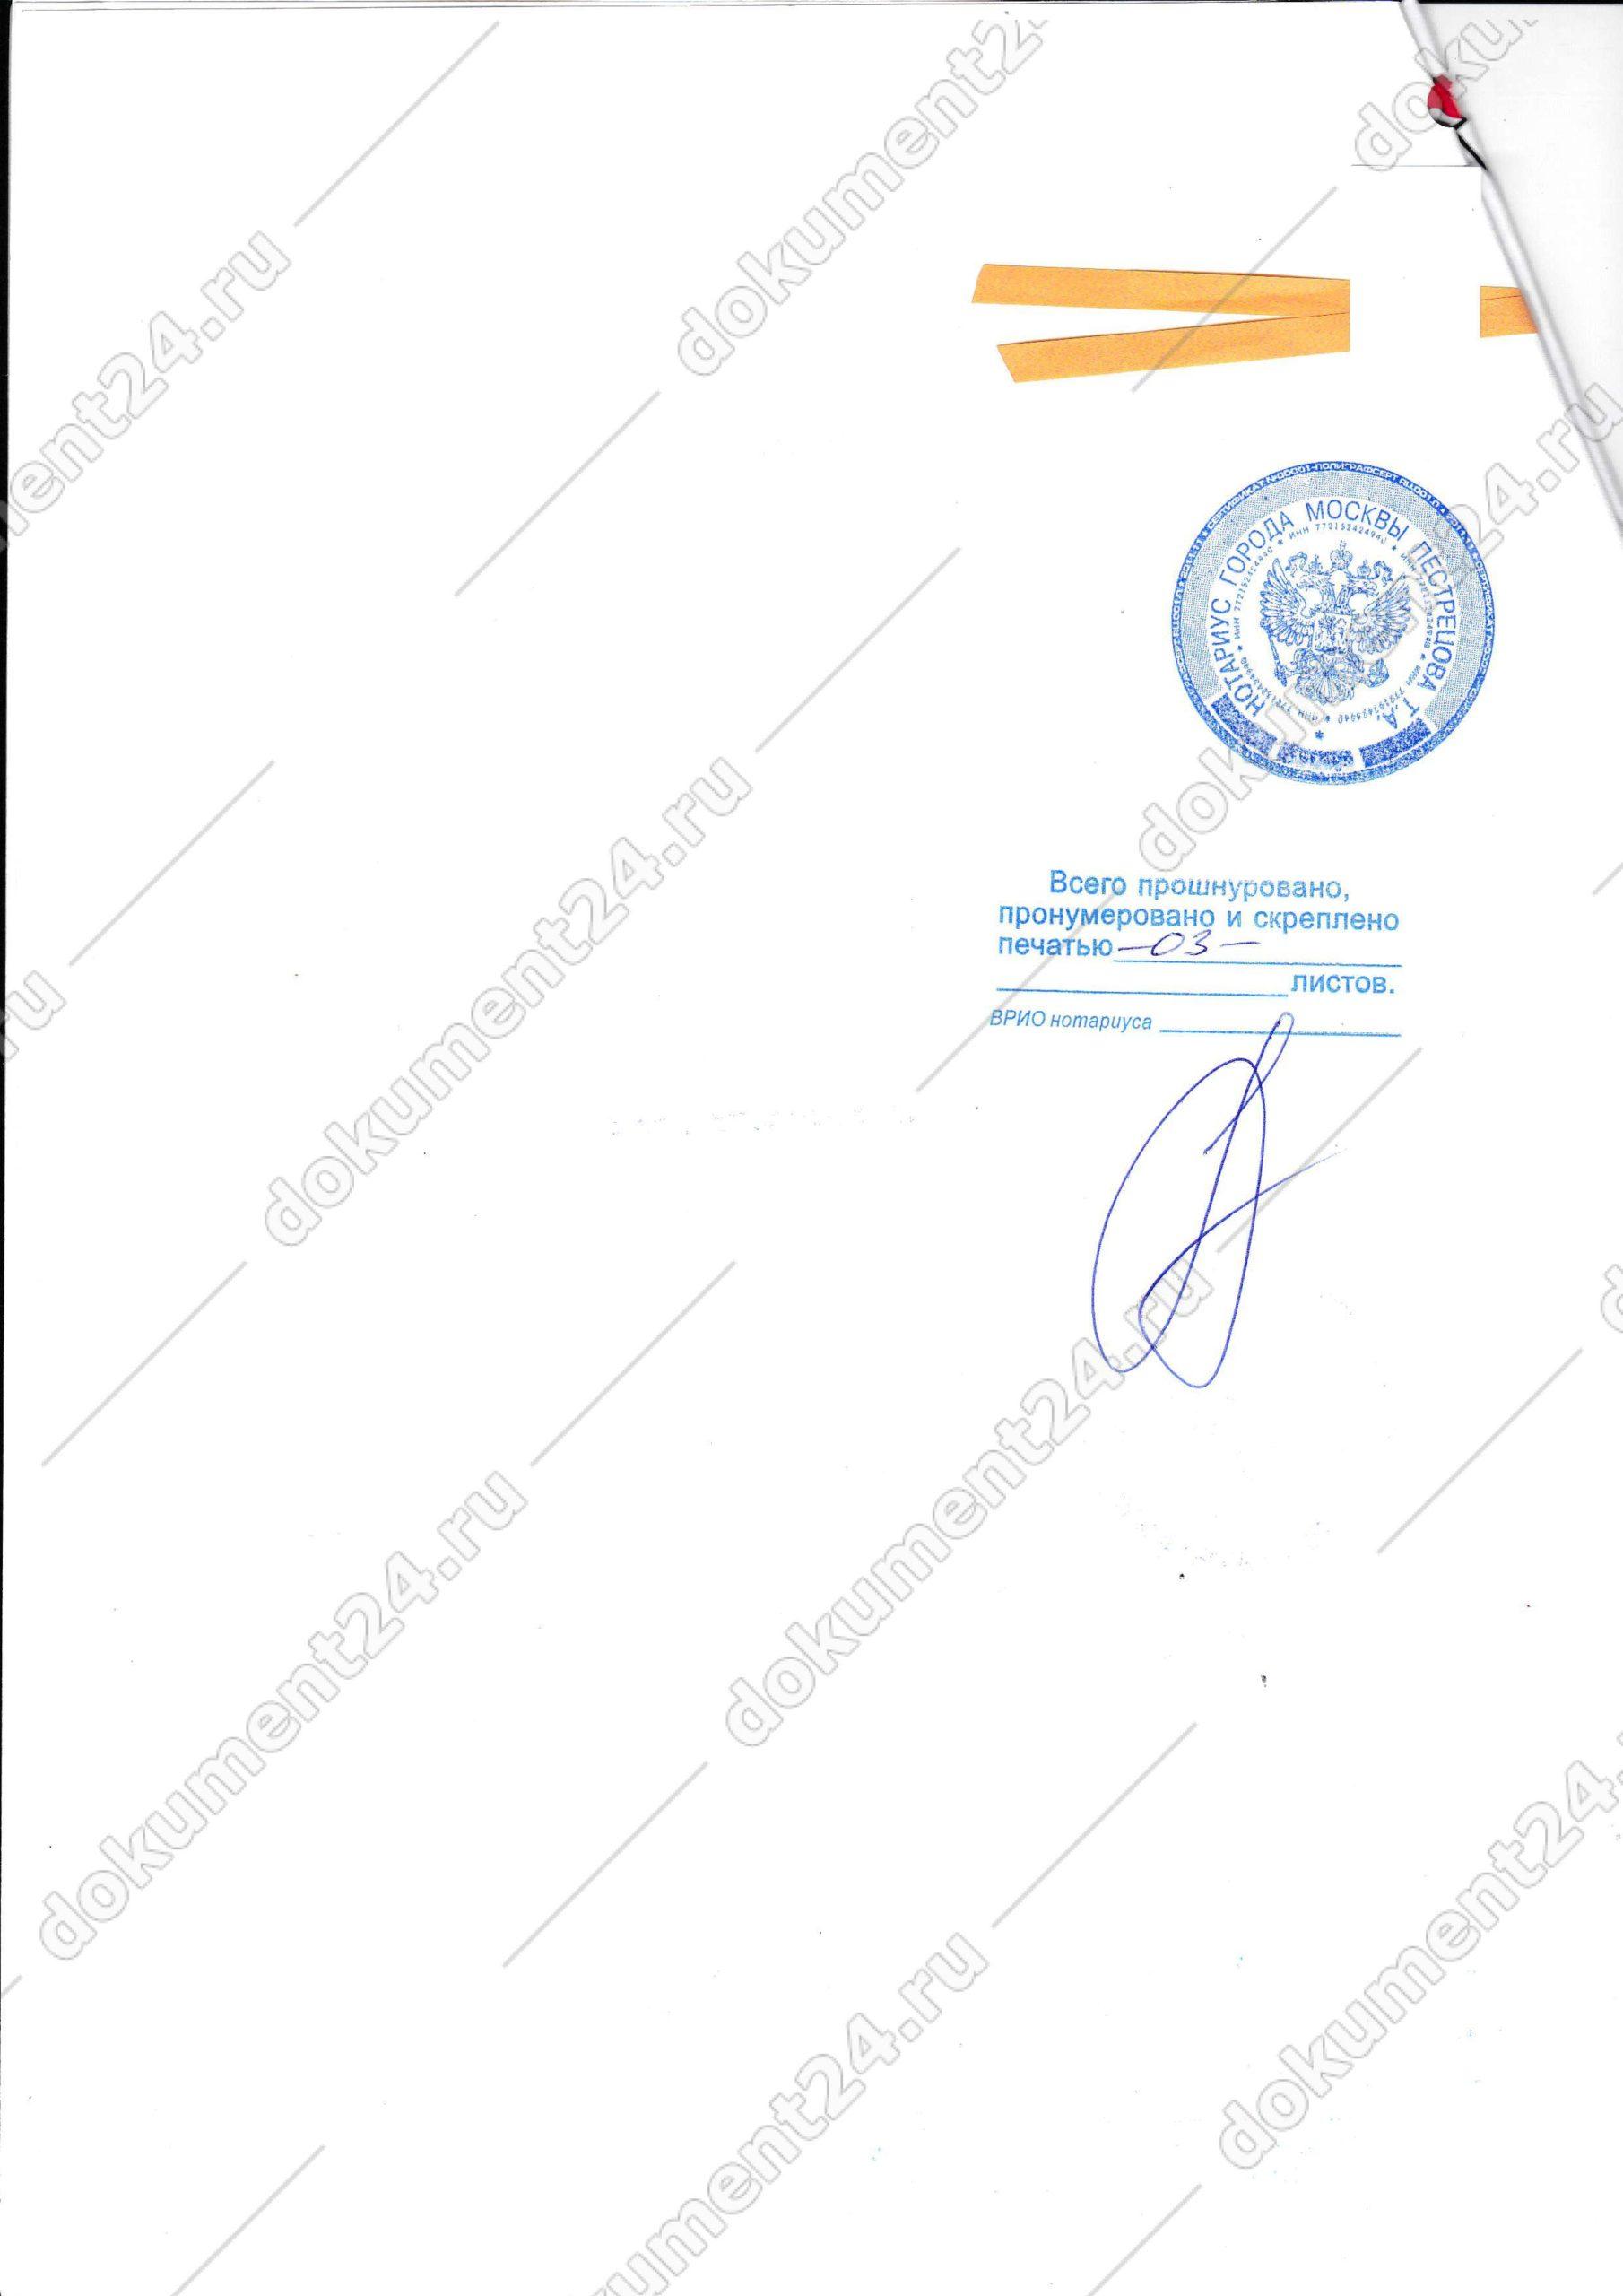 spravka otsutstvie braka notarialnyi perevod arabskii